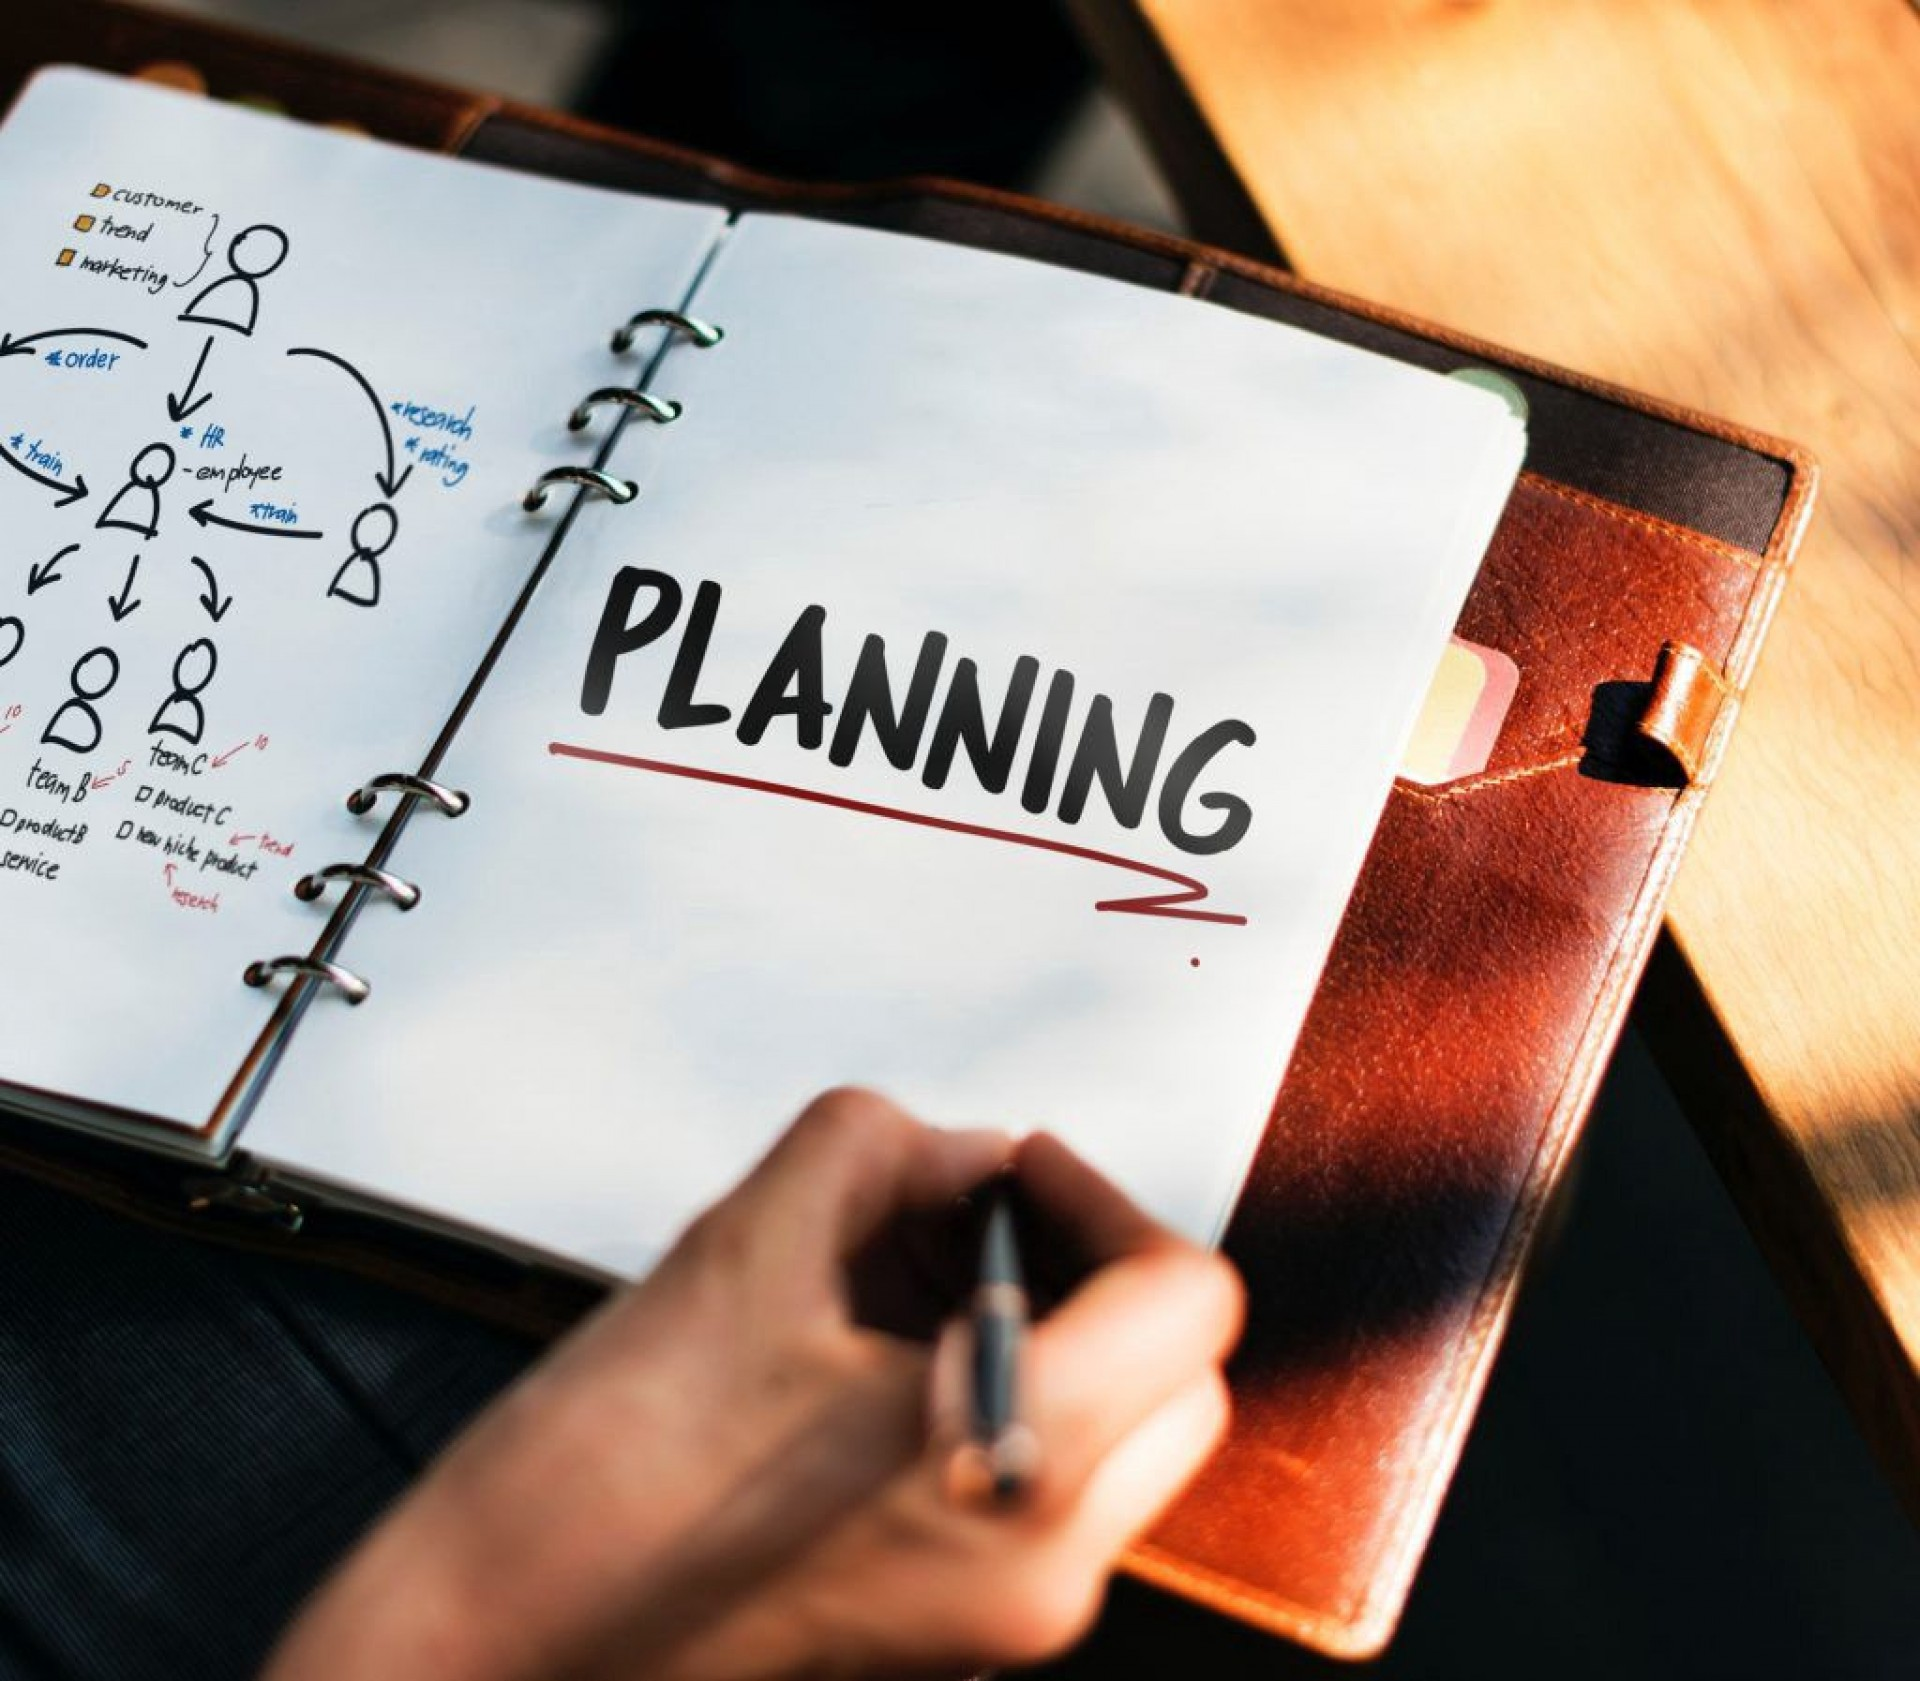 000 Fantastic Employee Development Plan Example Inspiration  Workforce Personal Career1920